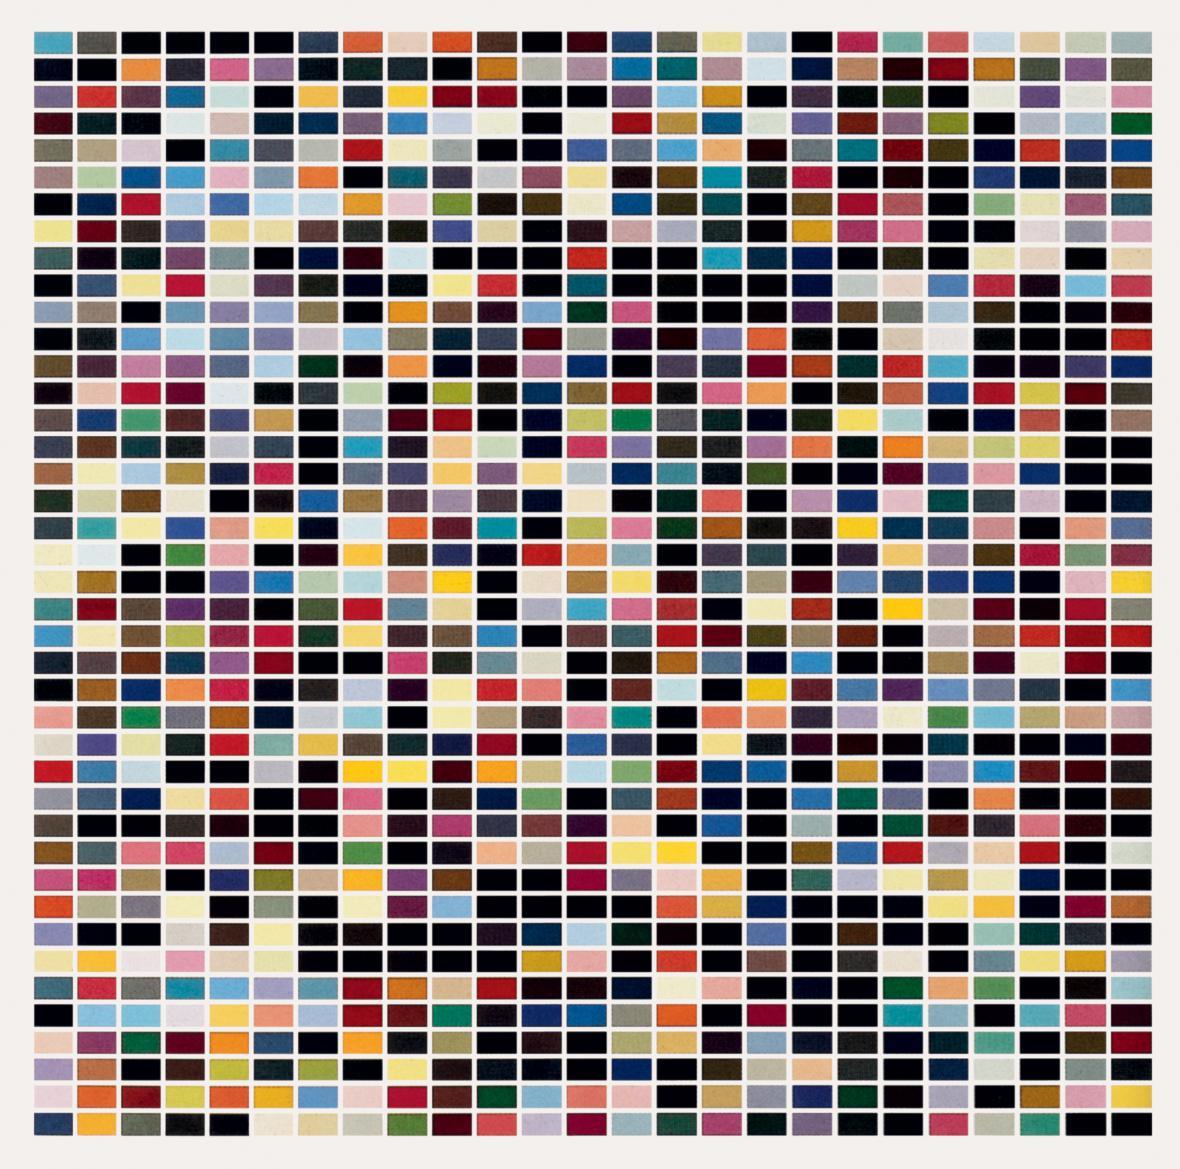 Gerhard Richter / 1025 barev, 1974